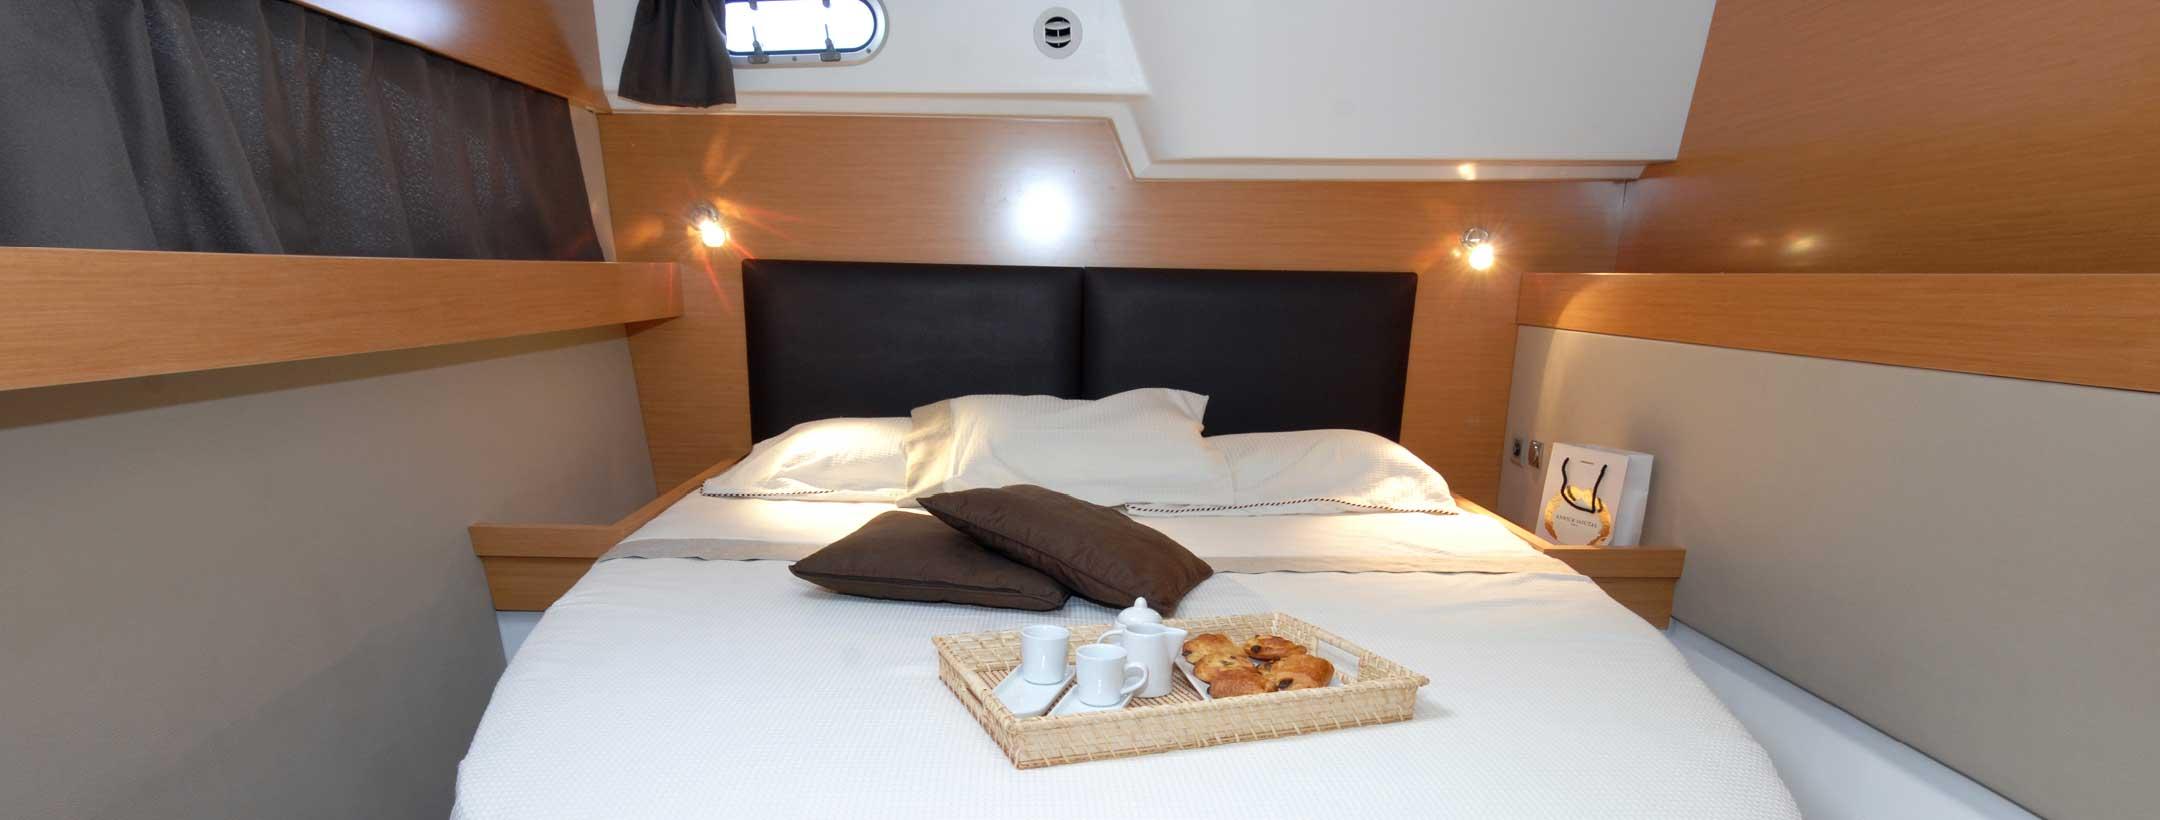 TradeWinds 50 Cruising Class Yacht cabin